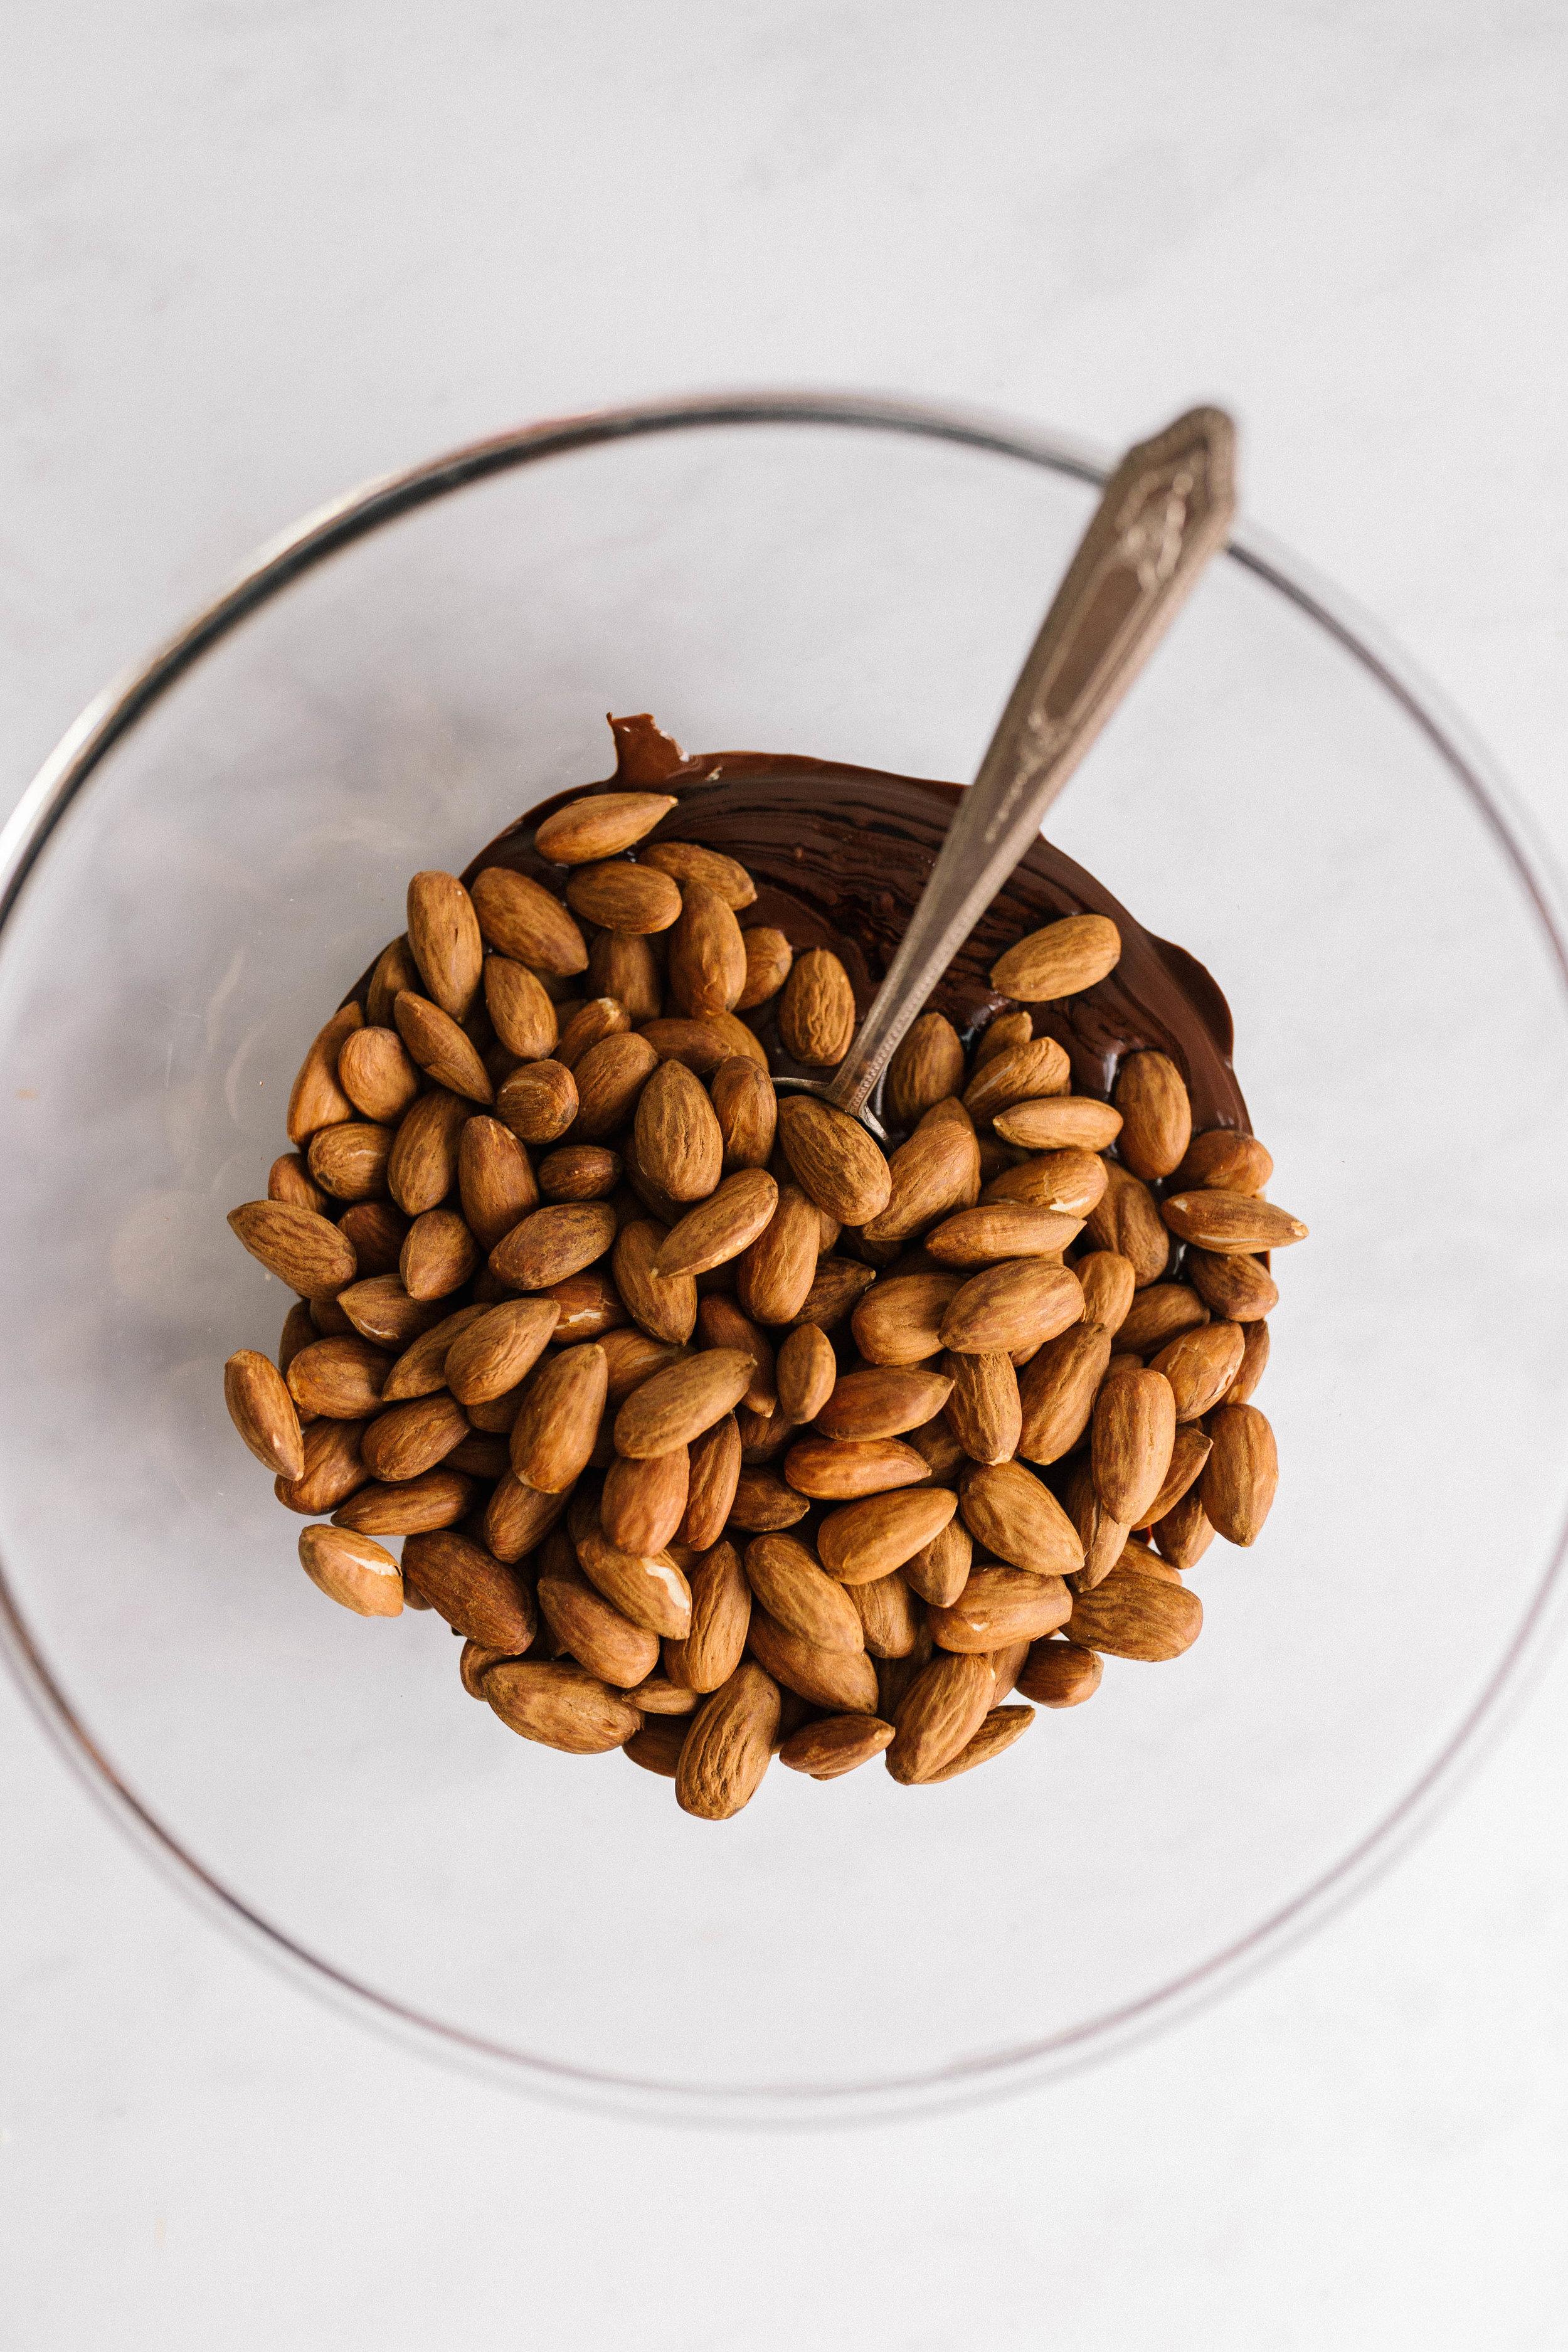 Salted Dark Chocolate Roasted Almonds | Joy Felicity Jane